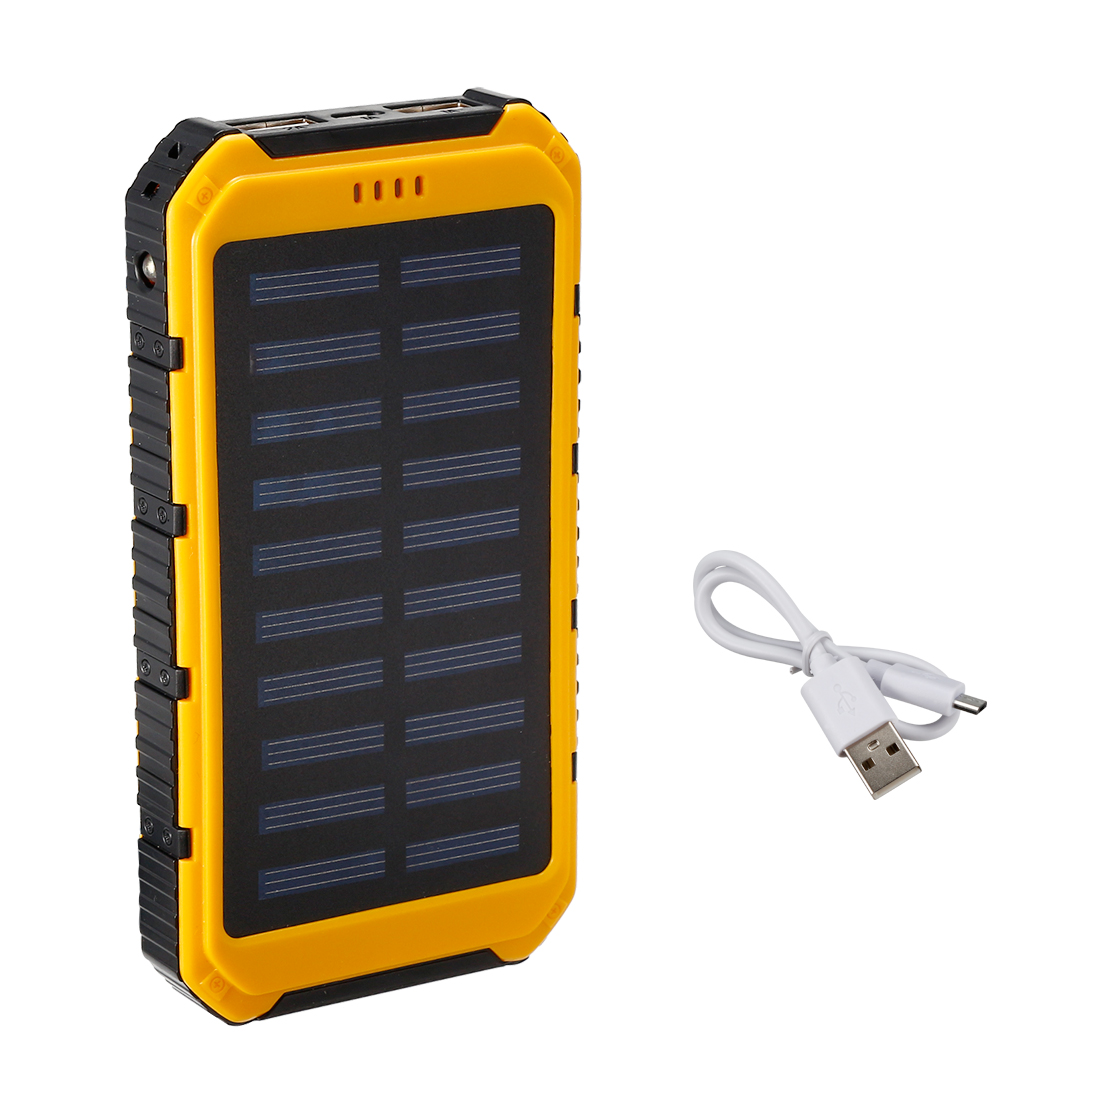 1.5W 8000mAh Solar Charger Dual USB Power Bank Phone Battery Flashlight Yellow